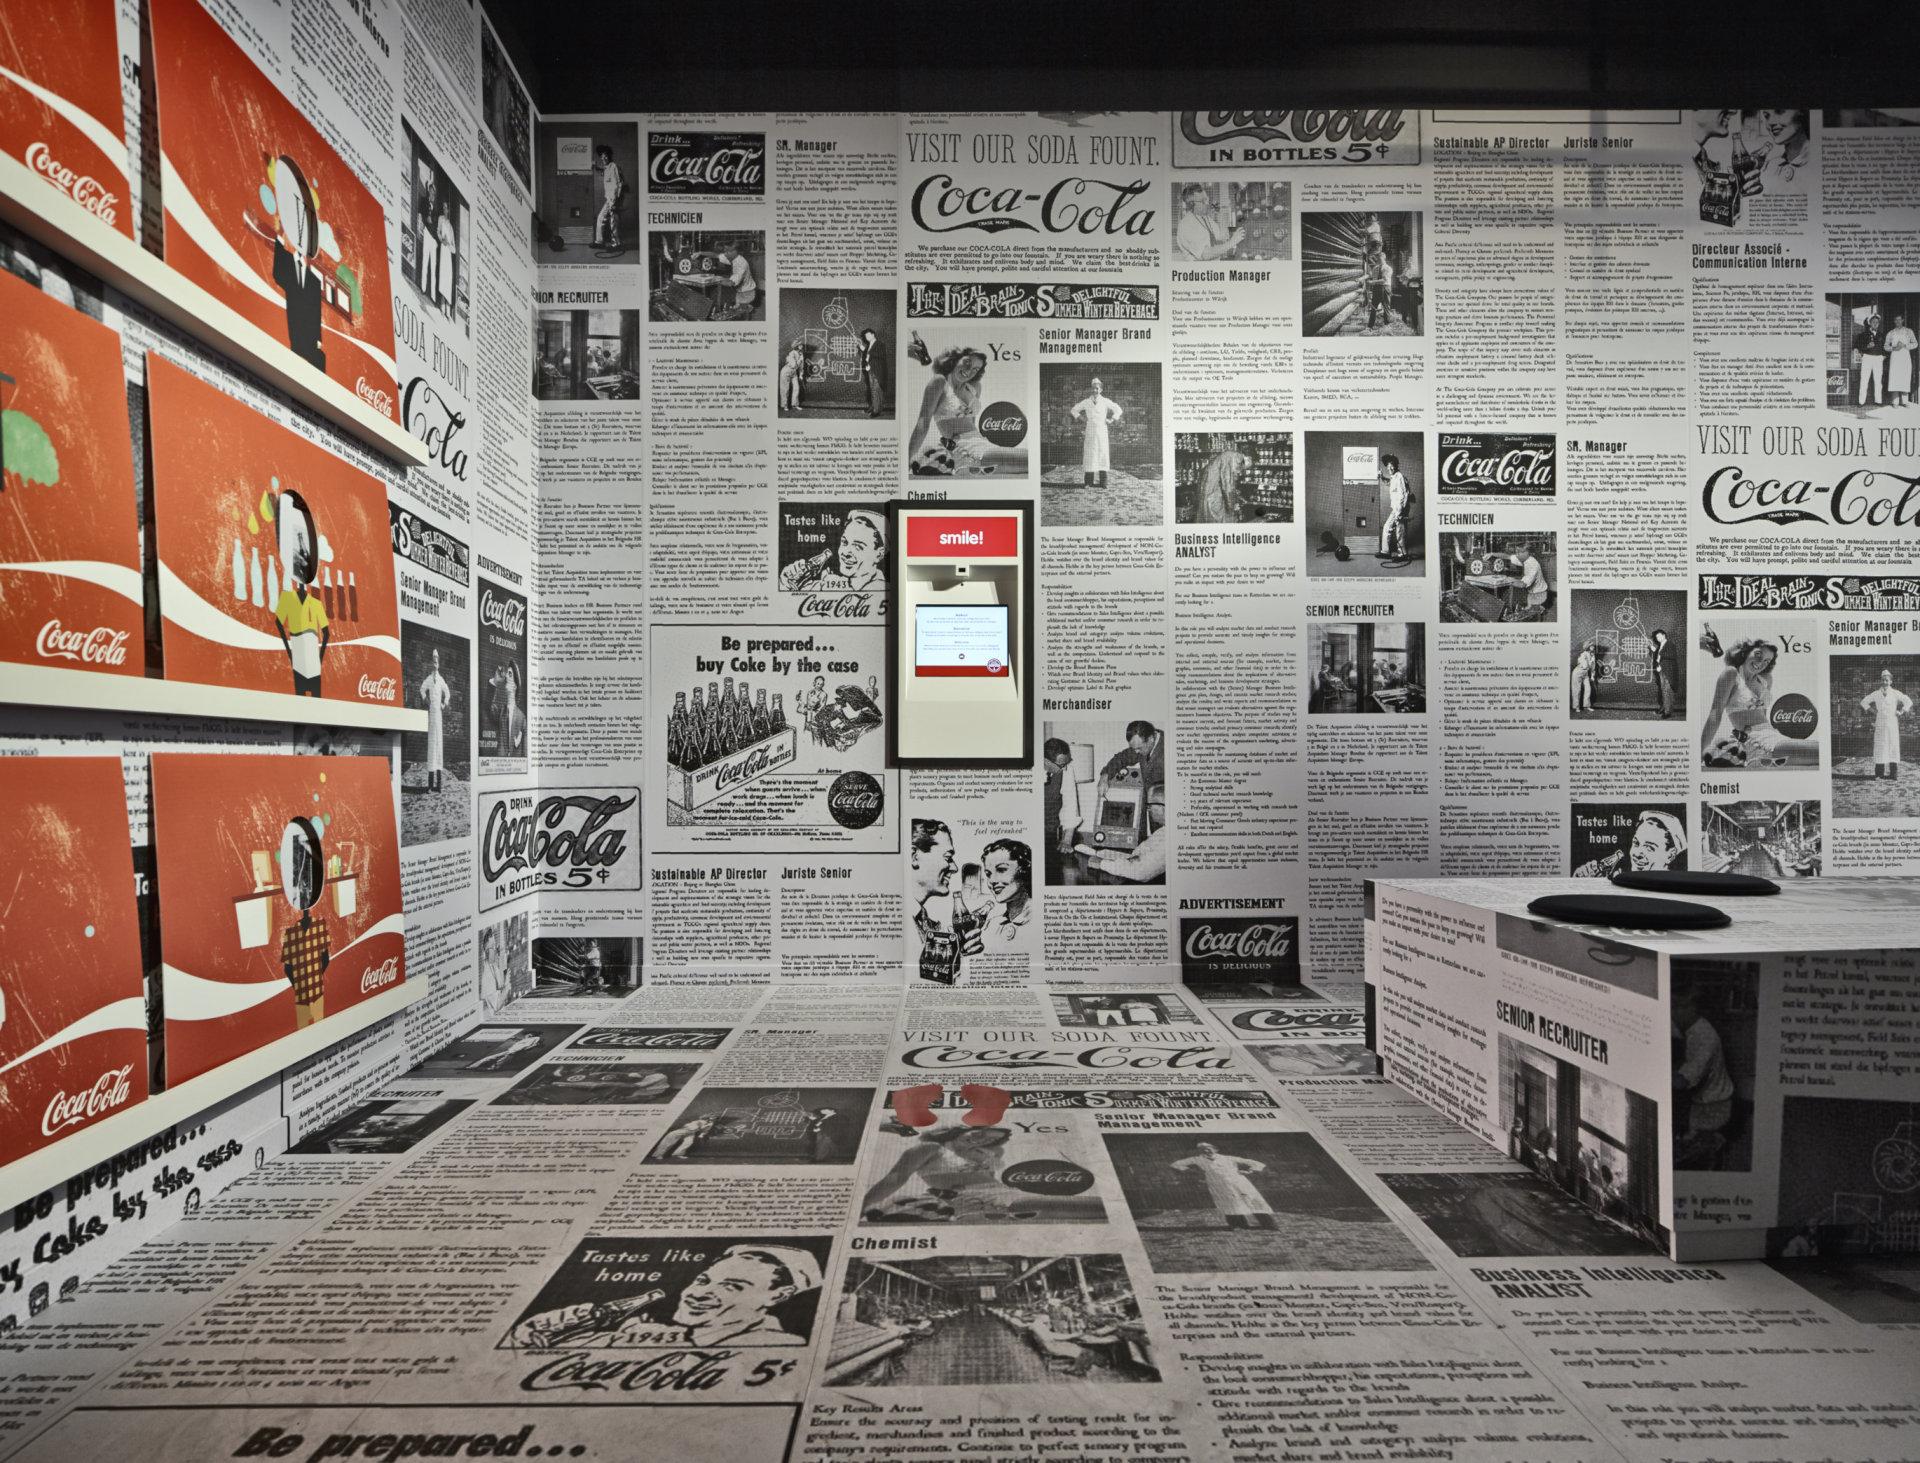 Creneau – Coca-Cola AJ